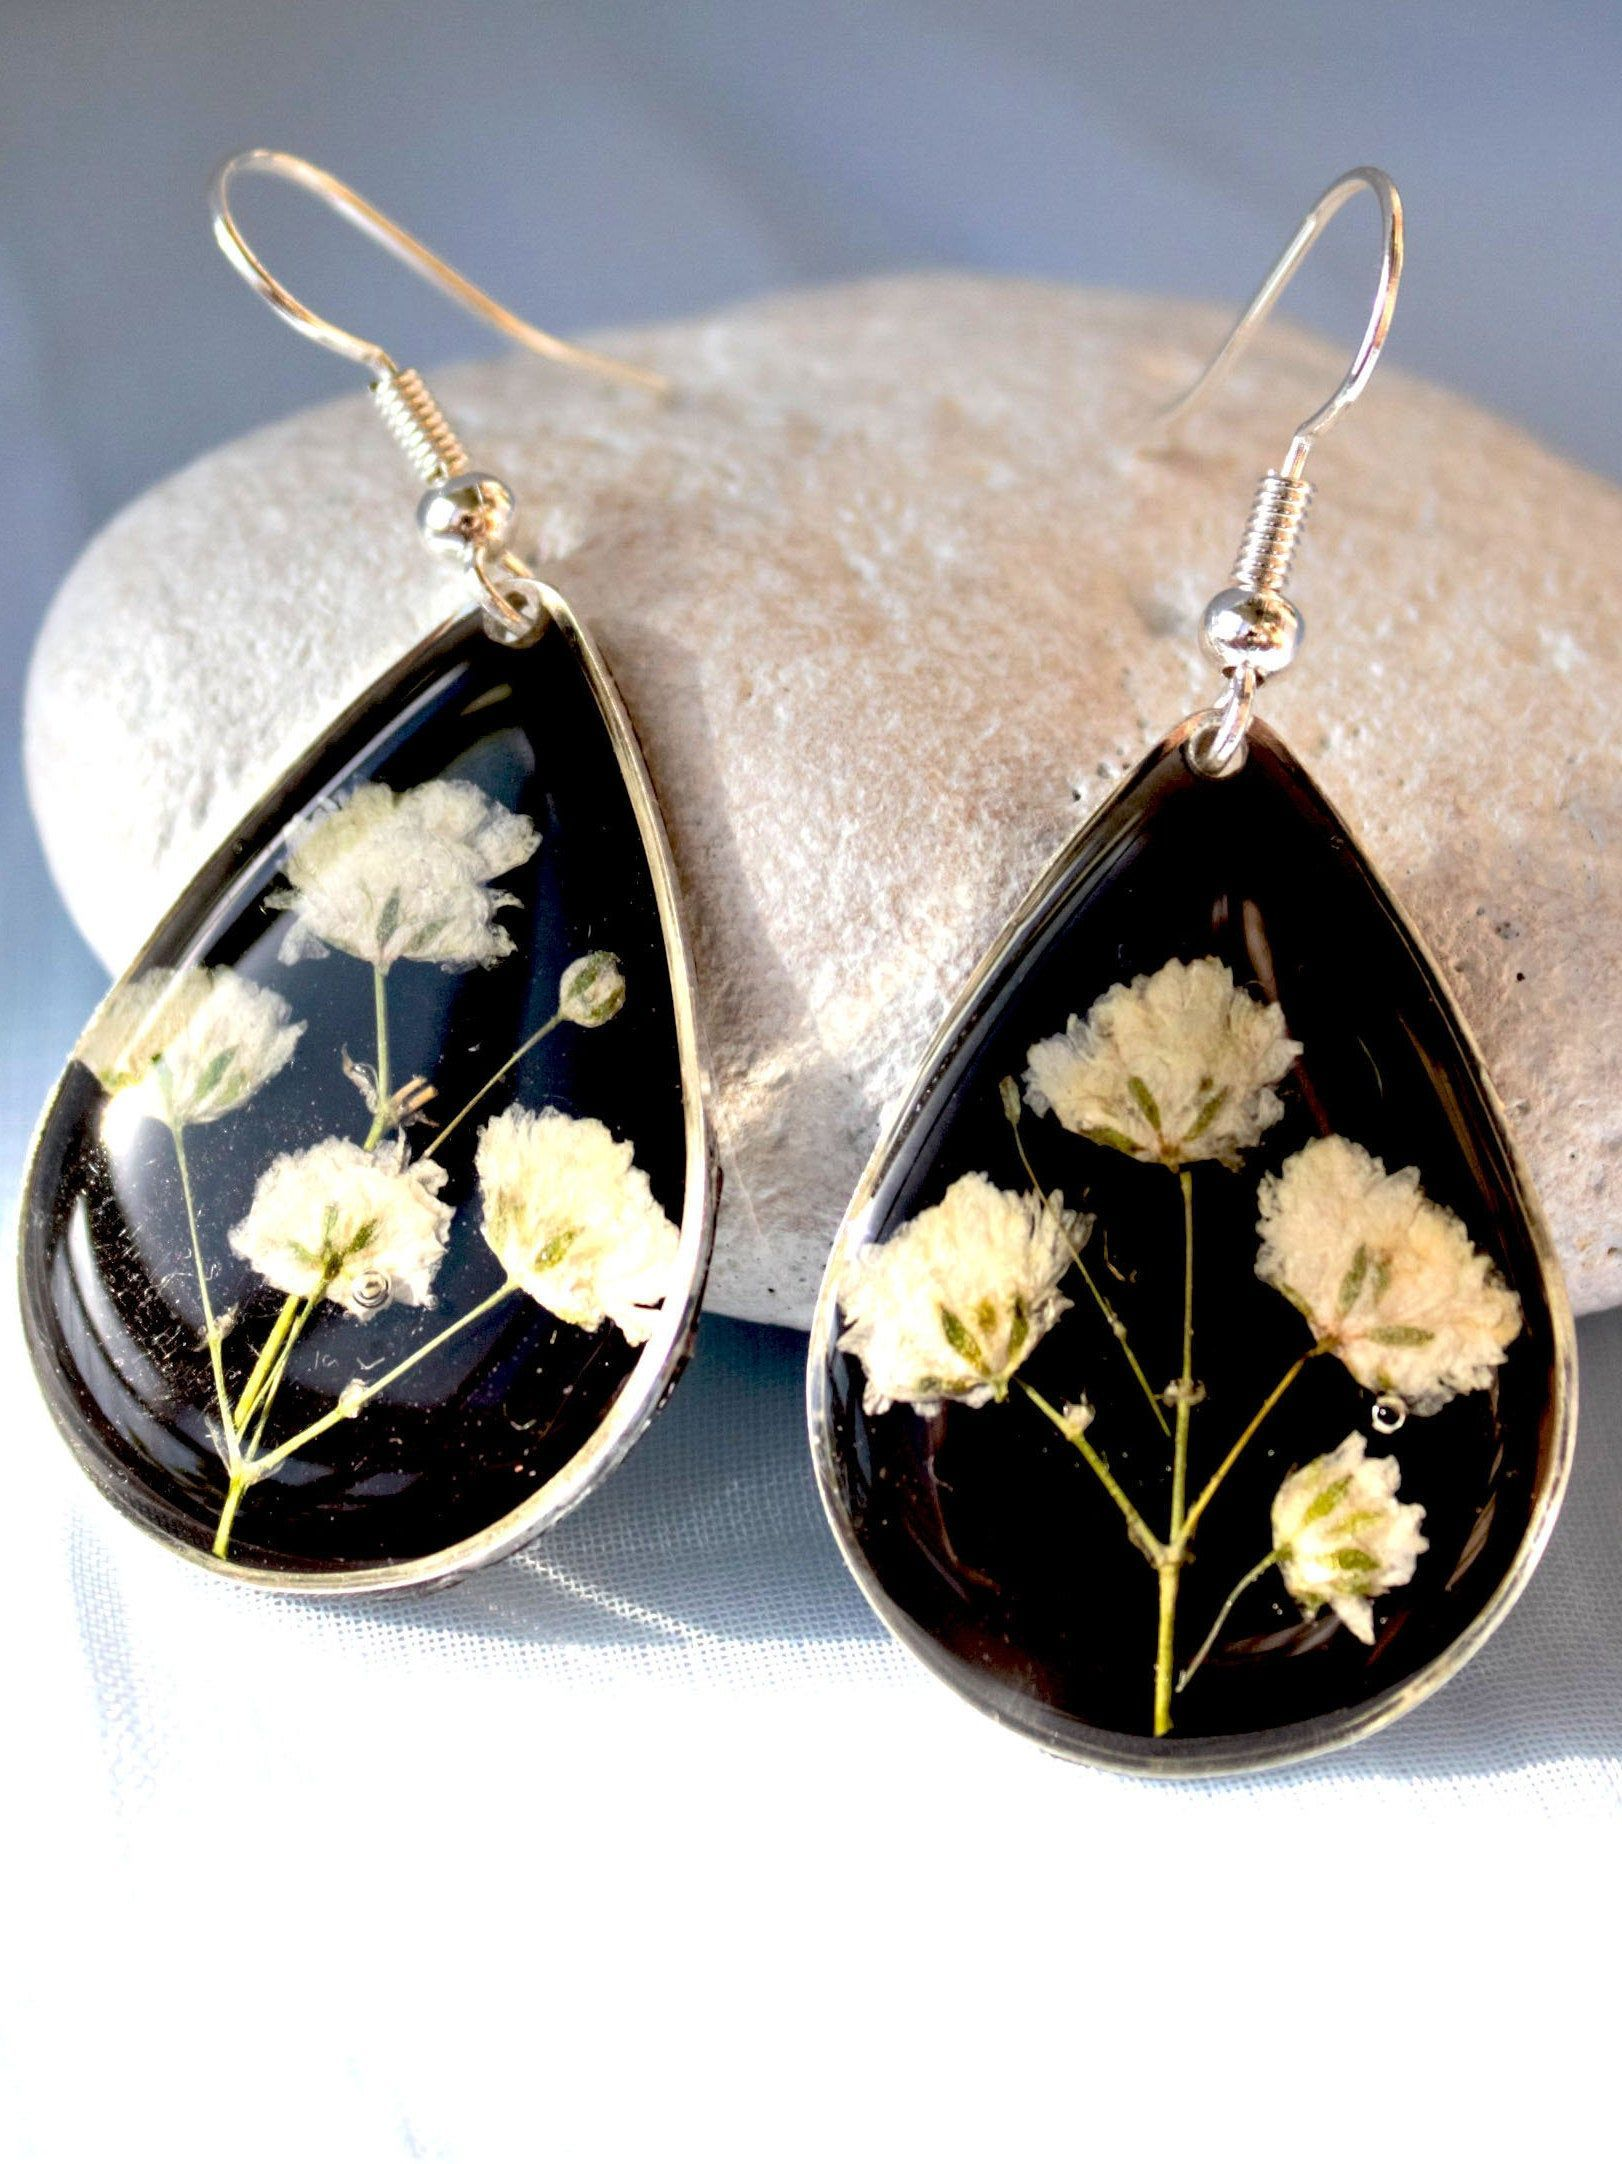 Pressed Fern Earrings Minimalist Jewelry Bridesmaid Gift Small Stud Earrings MINI Fern Stud Earrings Gifts for Her